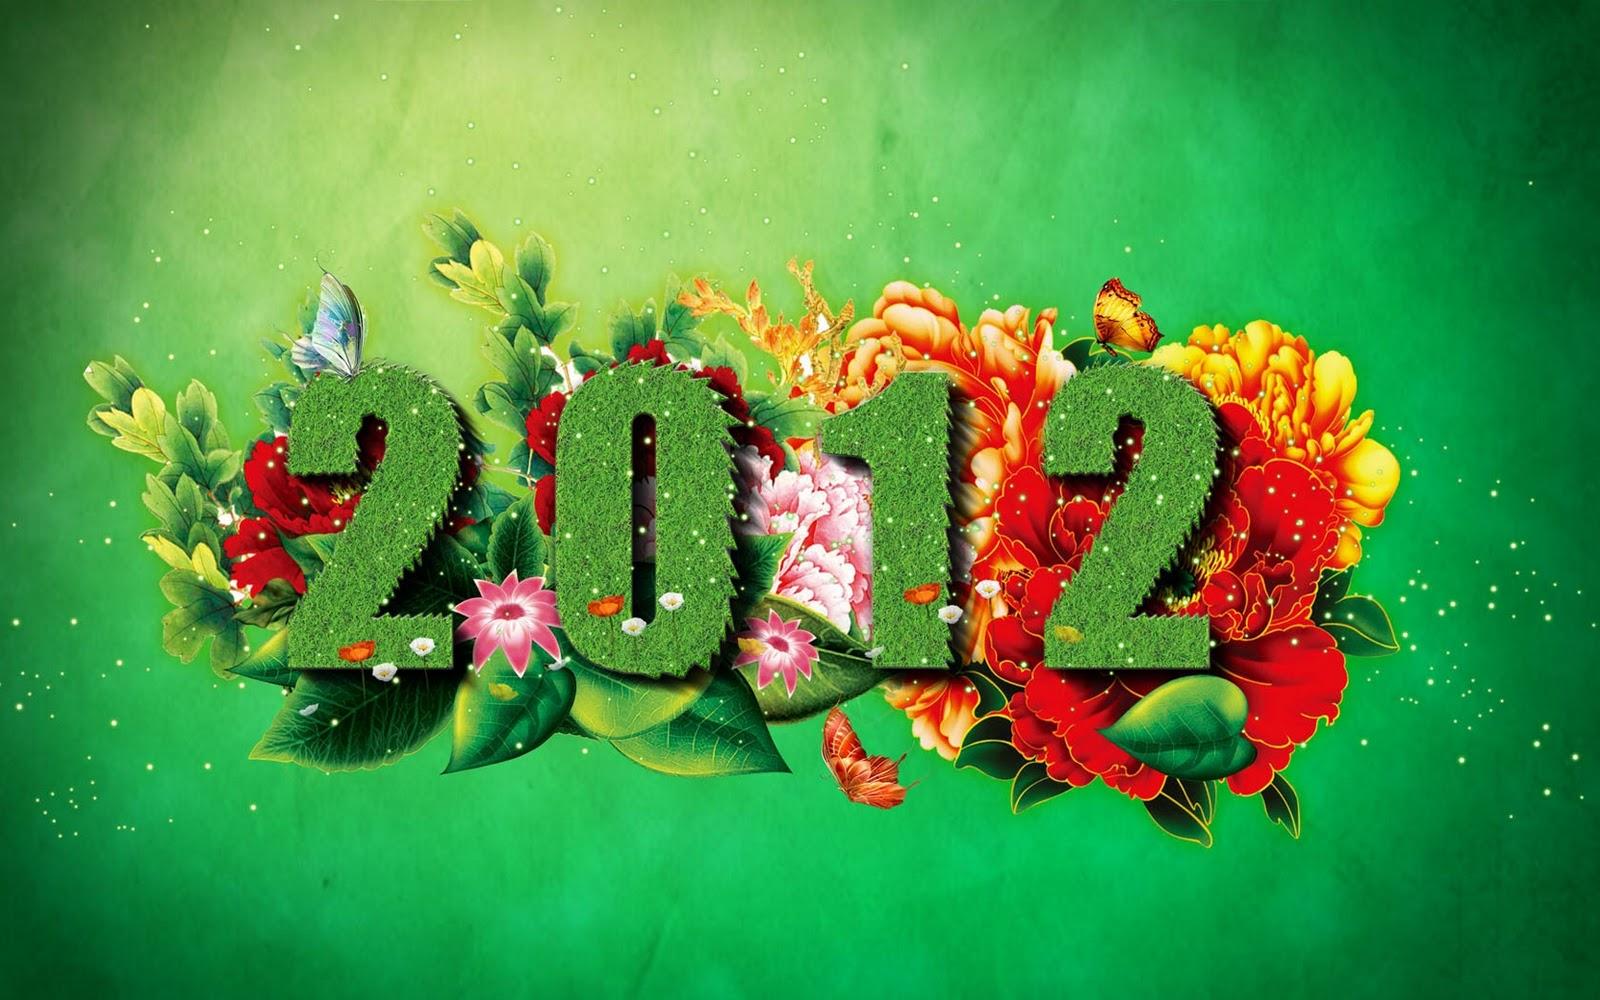 http://1.bp.blogspot.com/-8UhxlXBUW08/TwGzCSQMcSI/AAAAAAAAEGw/NUvCdmYhCjY/s1600/Happy_New_Year_2012_Wallpaper_1680x1050_wallpaperhere.jpg